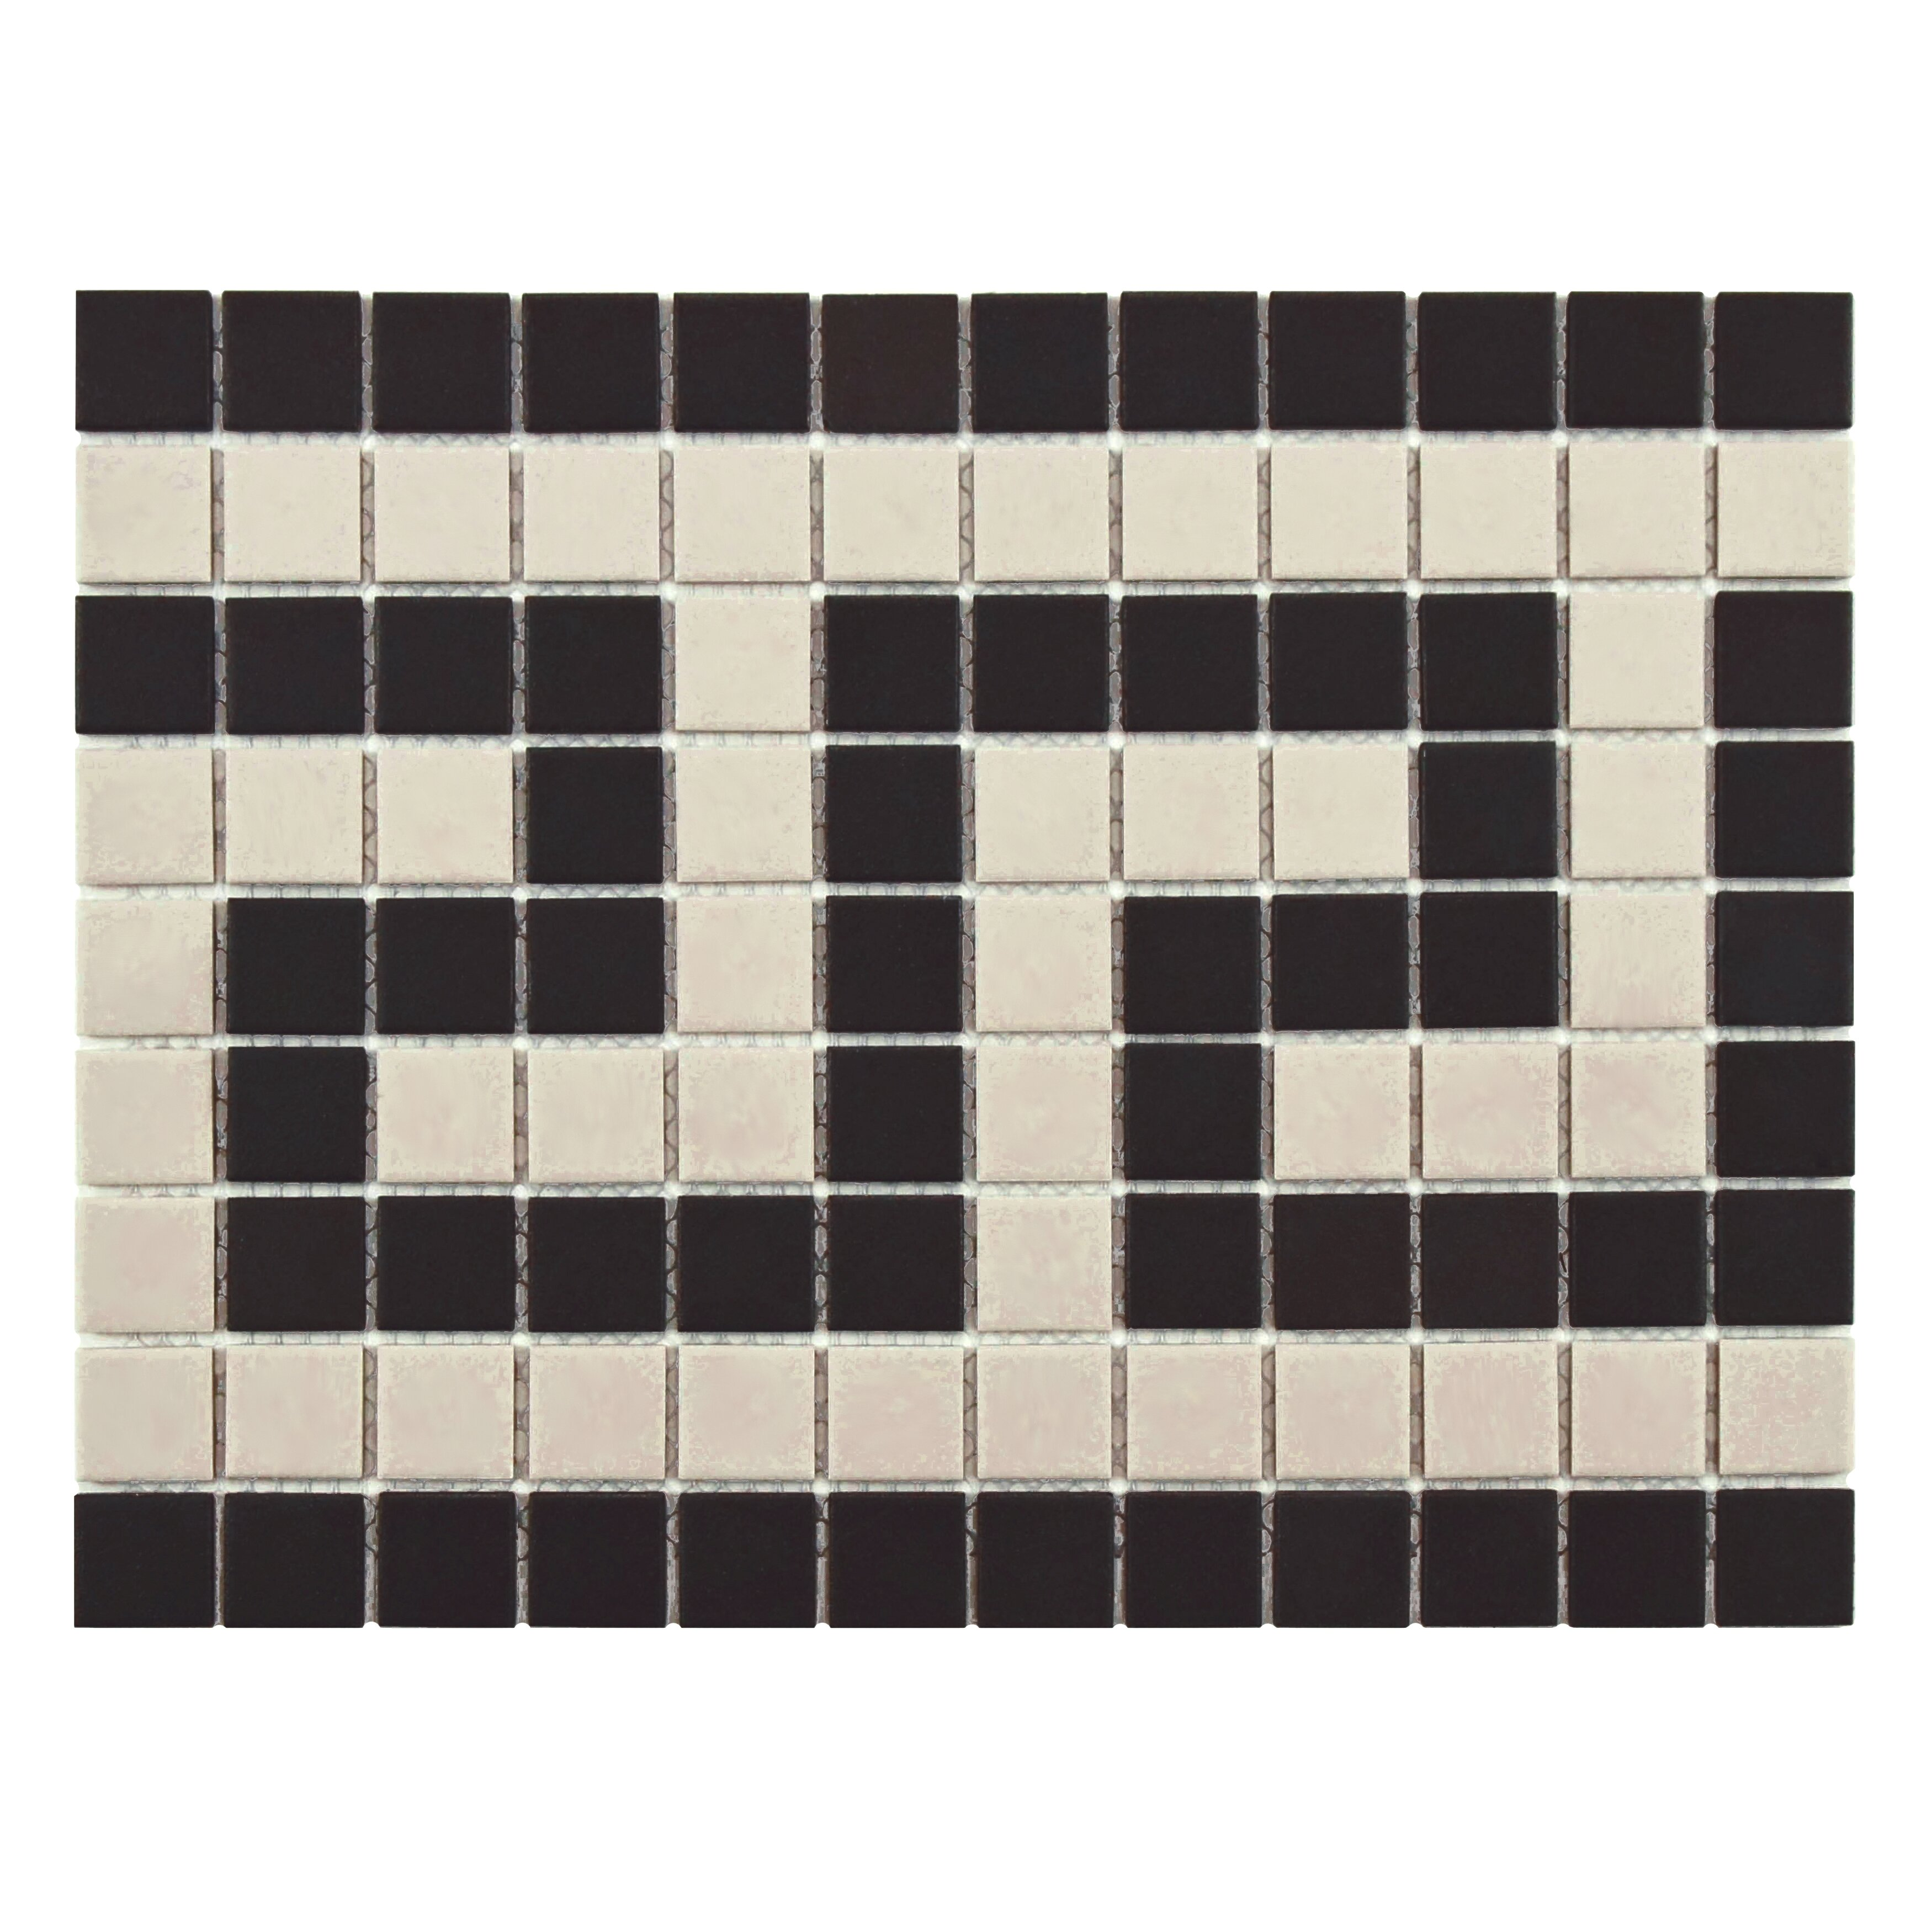 EliteTile New York 1 X 1 Unglazed Porcelain Floor and Wall Trim  Tile in